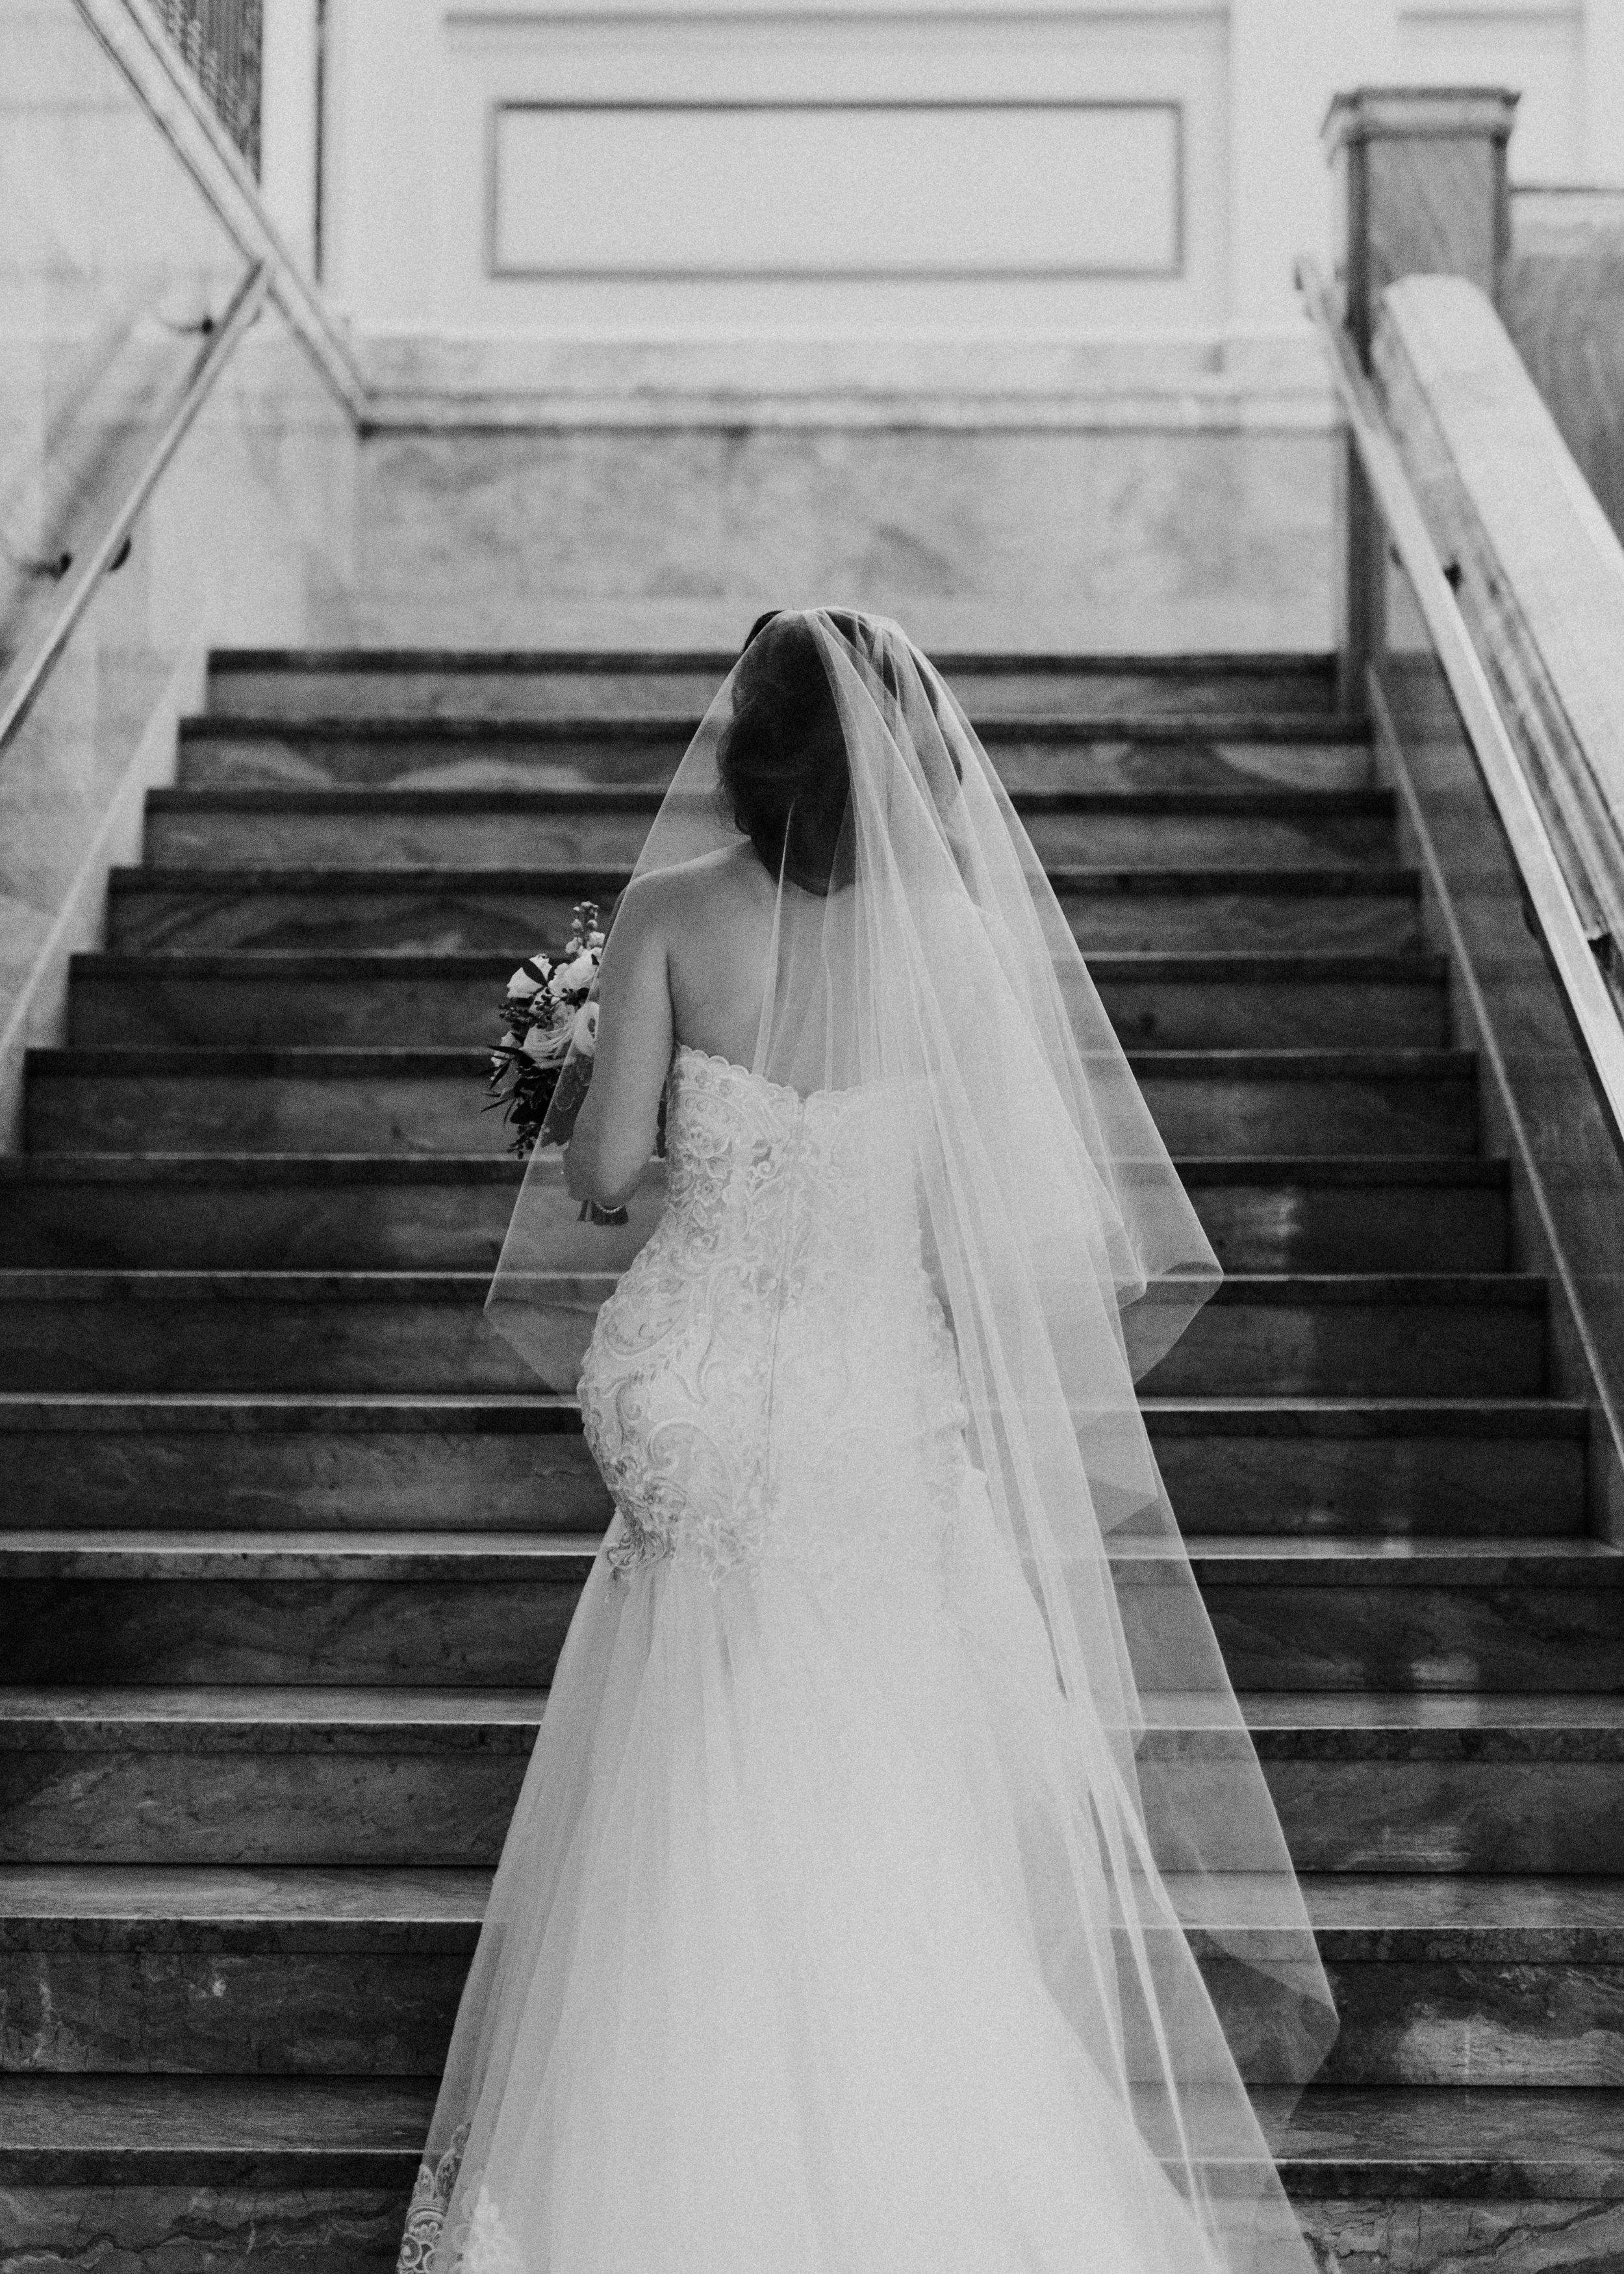 HeraStudios_FatemahVictor_Wedding_SelectsFull-11.jpg